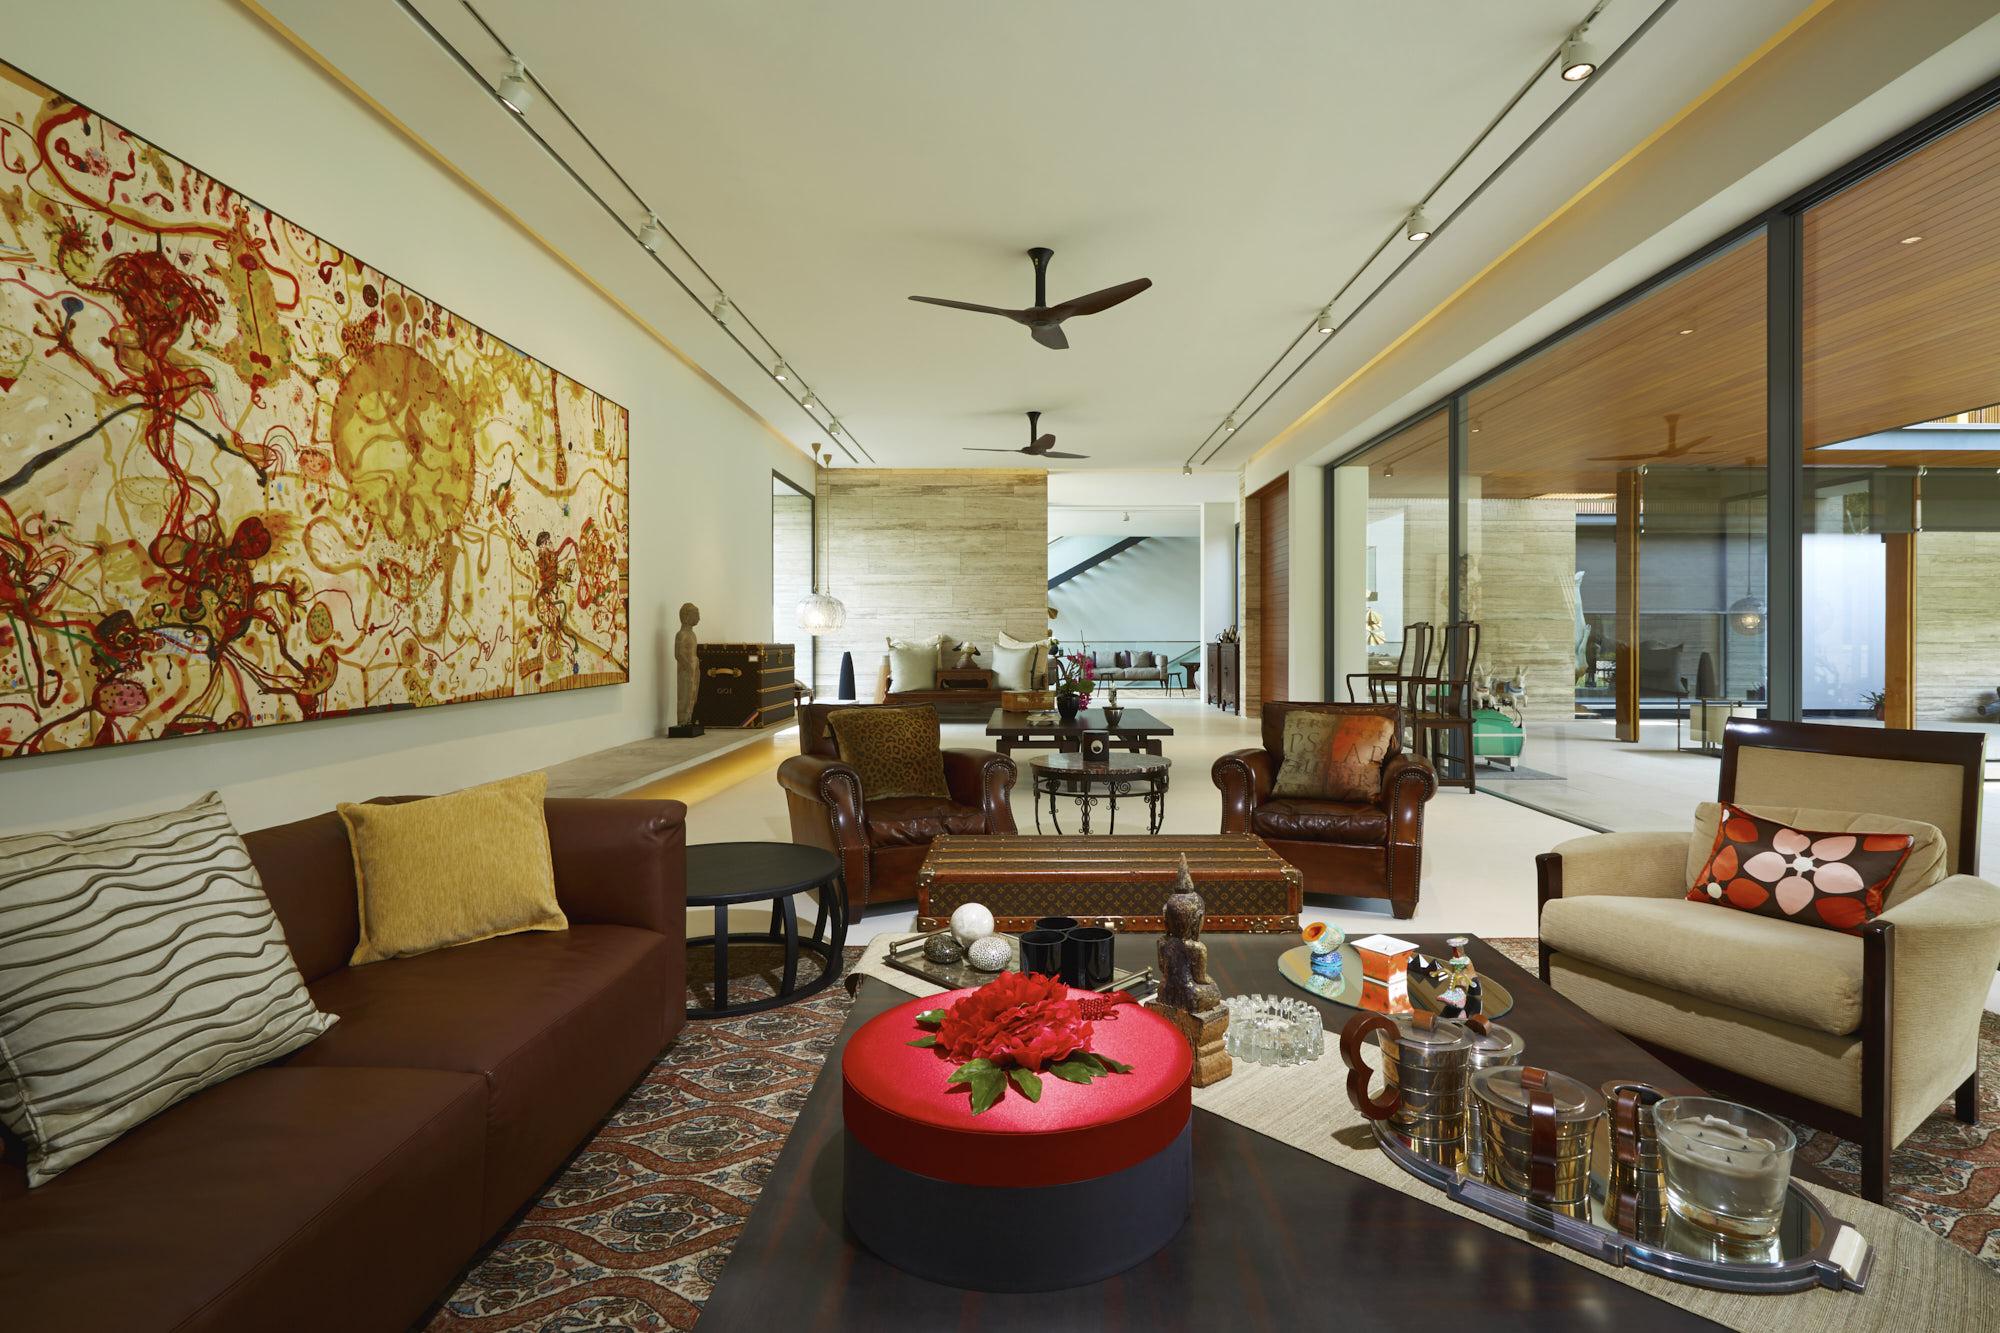 Nassim_Living Room_124_Final.jpg